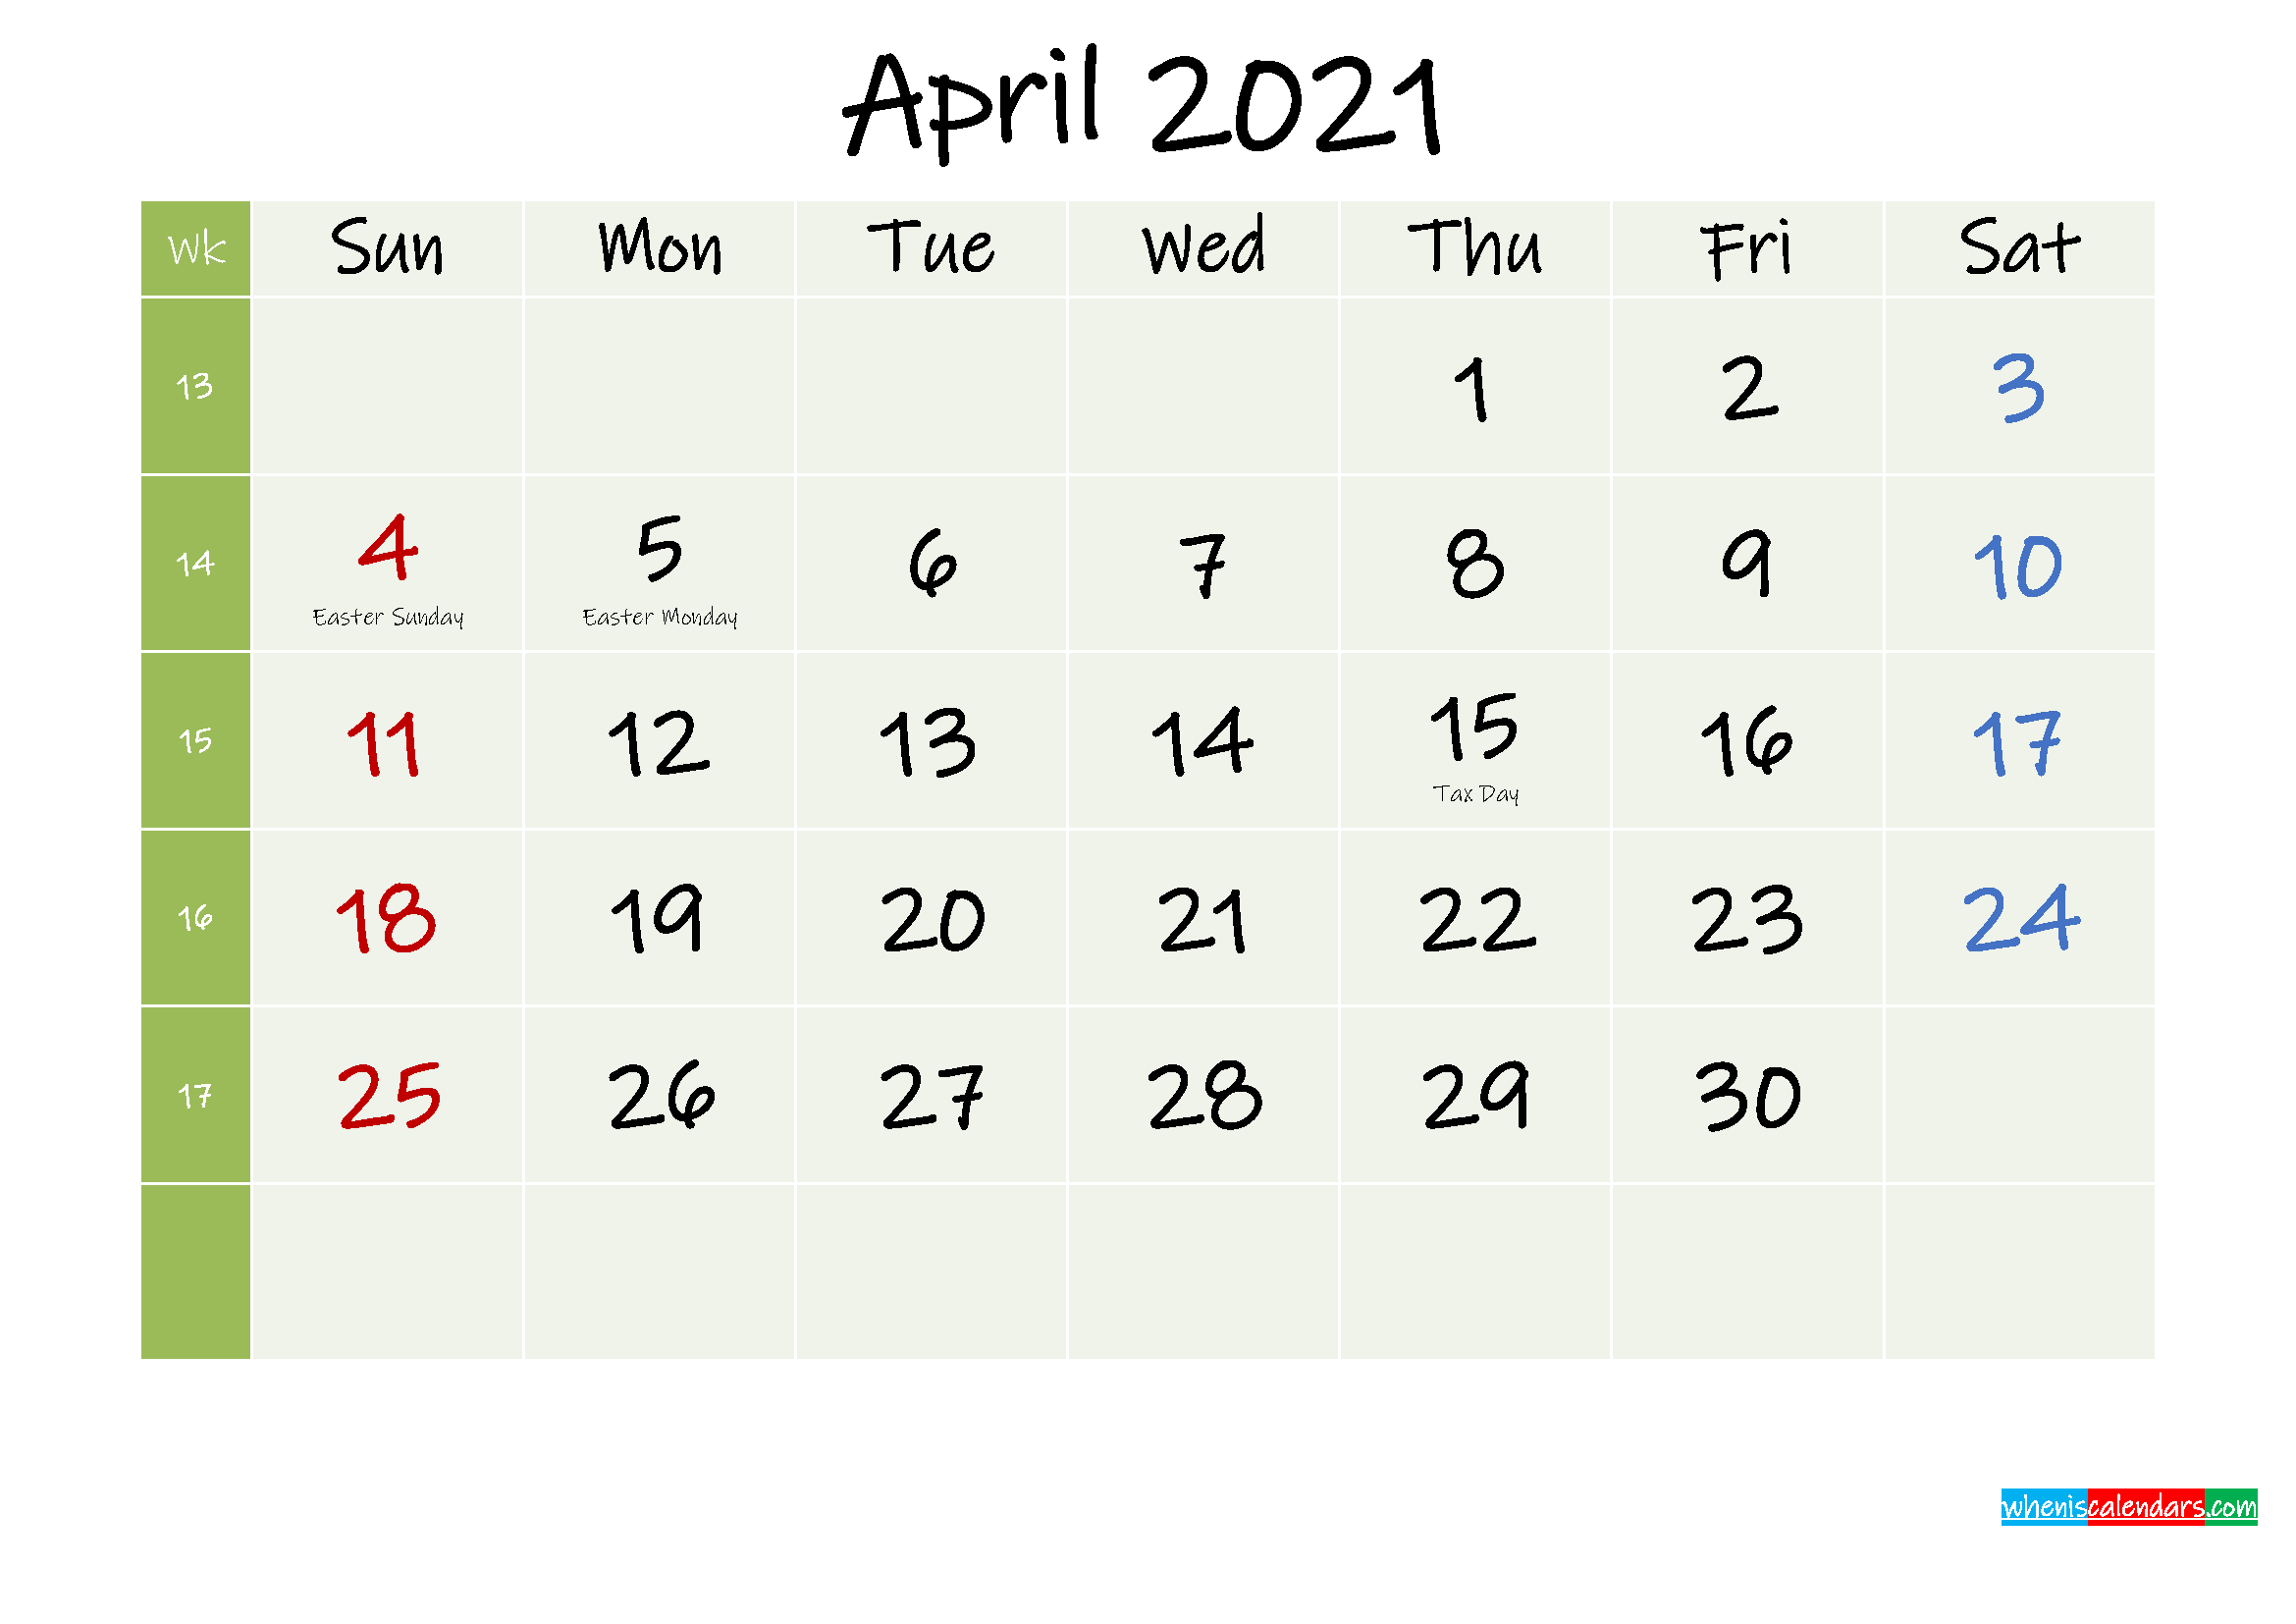 April 2021 Calendar with Holidays Printable